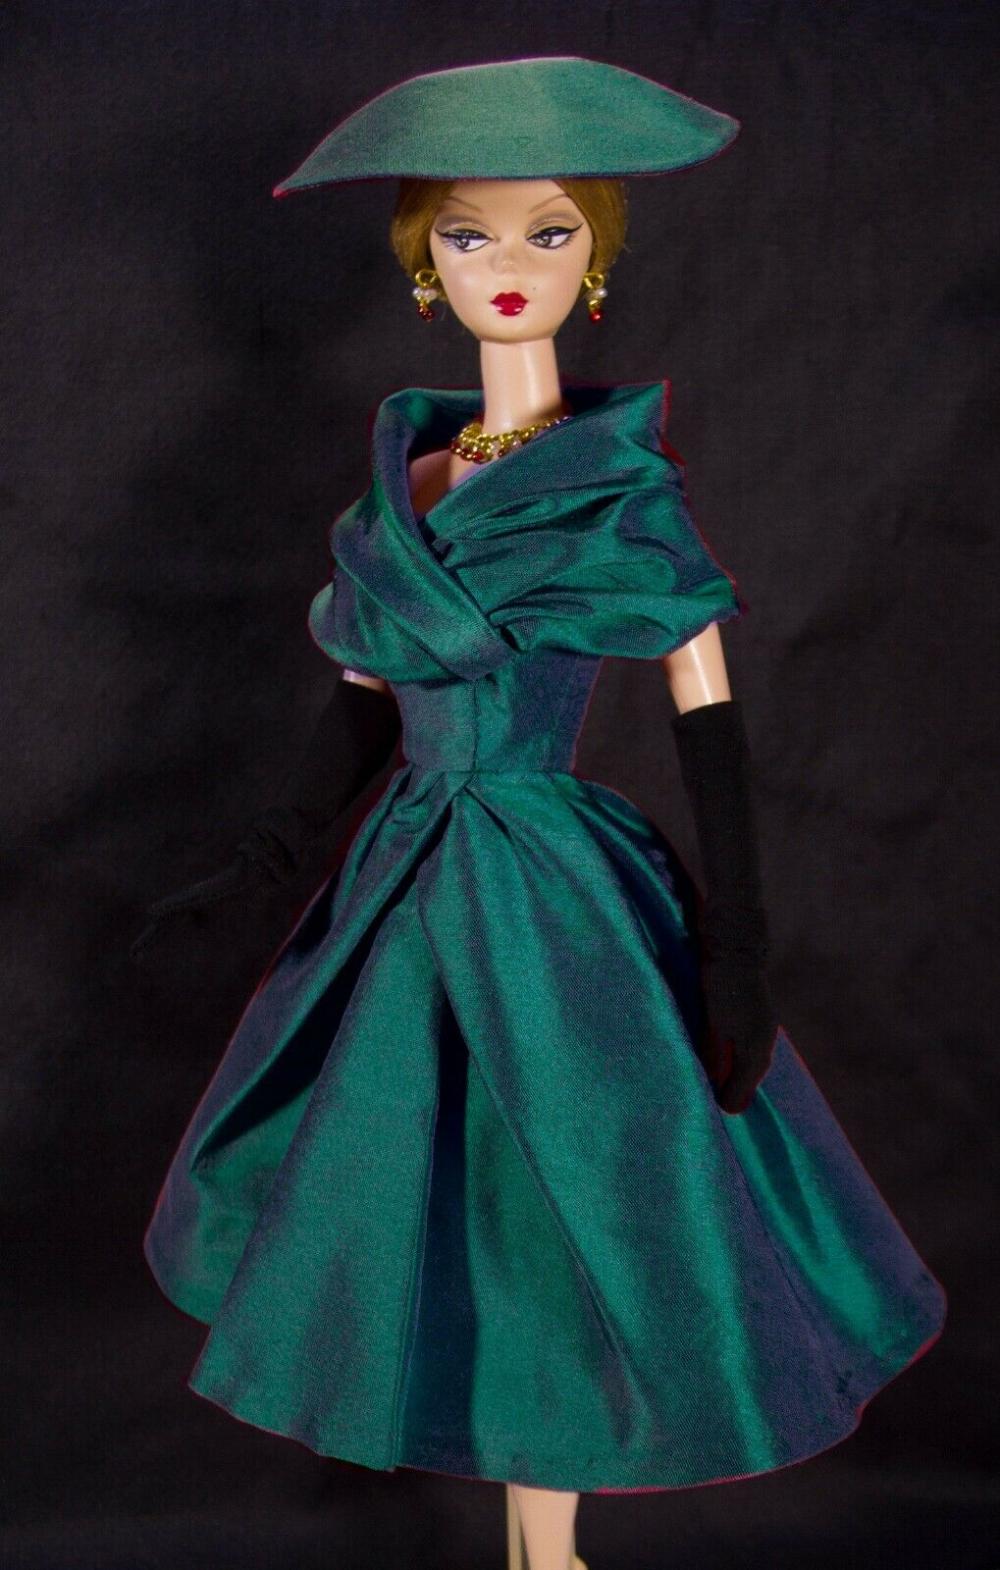 Dress On Demand Ooak Outfit Fits To Vintage Silkstone Barbie By D B Ebay In 2020 Vintage Barbie Clothes Doll Clothes Barbie Barbie Clothes